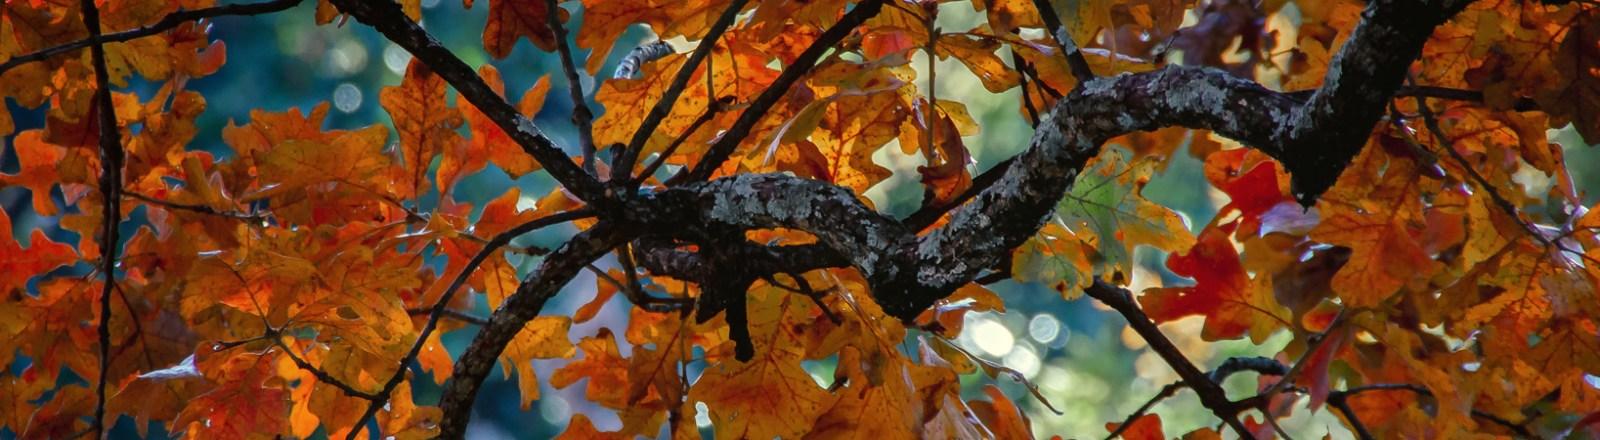 Autumn in Atlanta: Photo Mash-Up #5